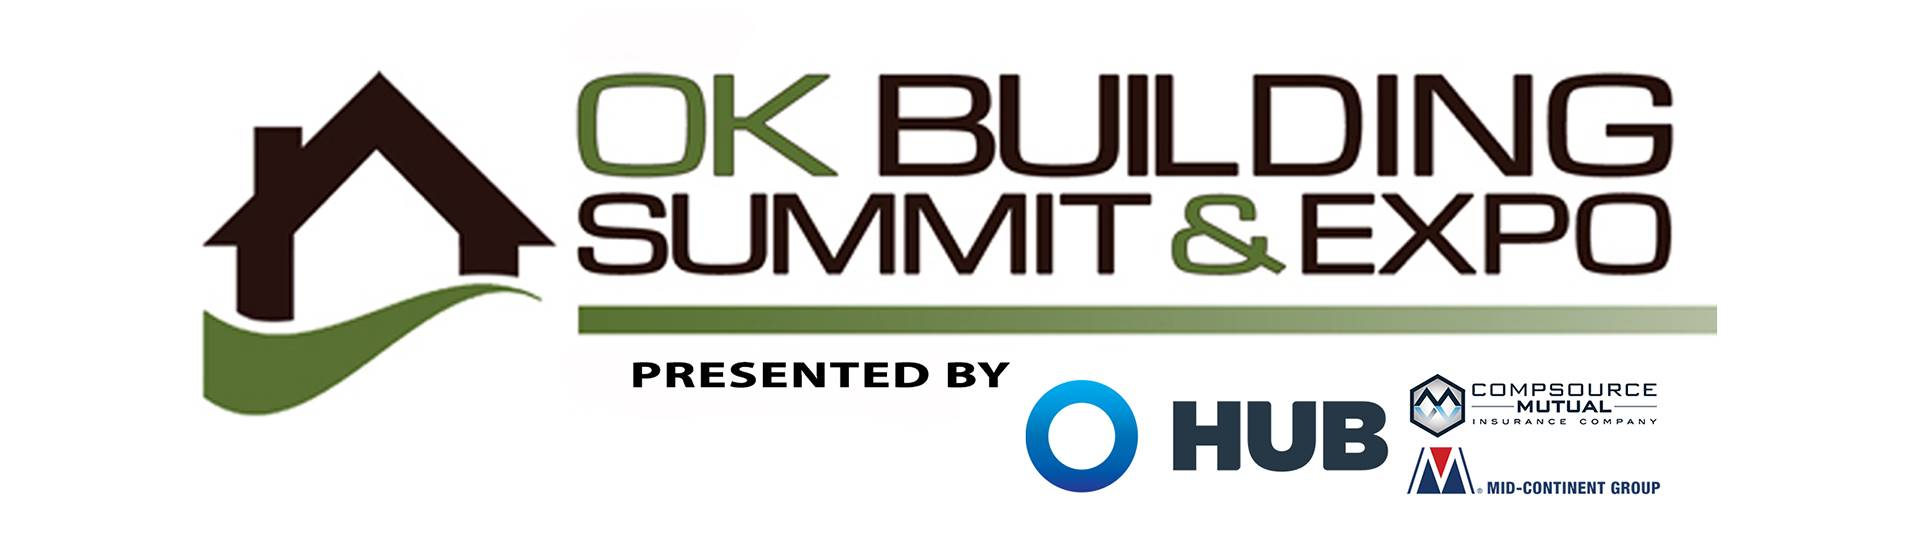 2021 OK Building Summit & Expo